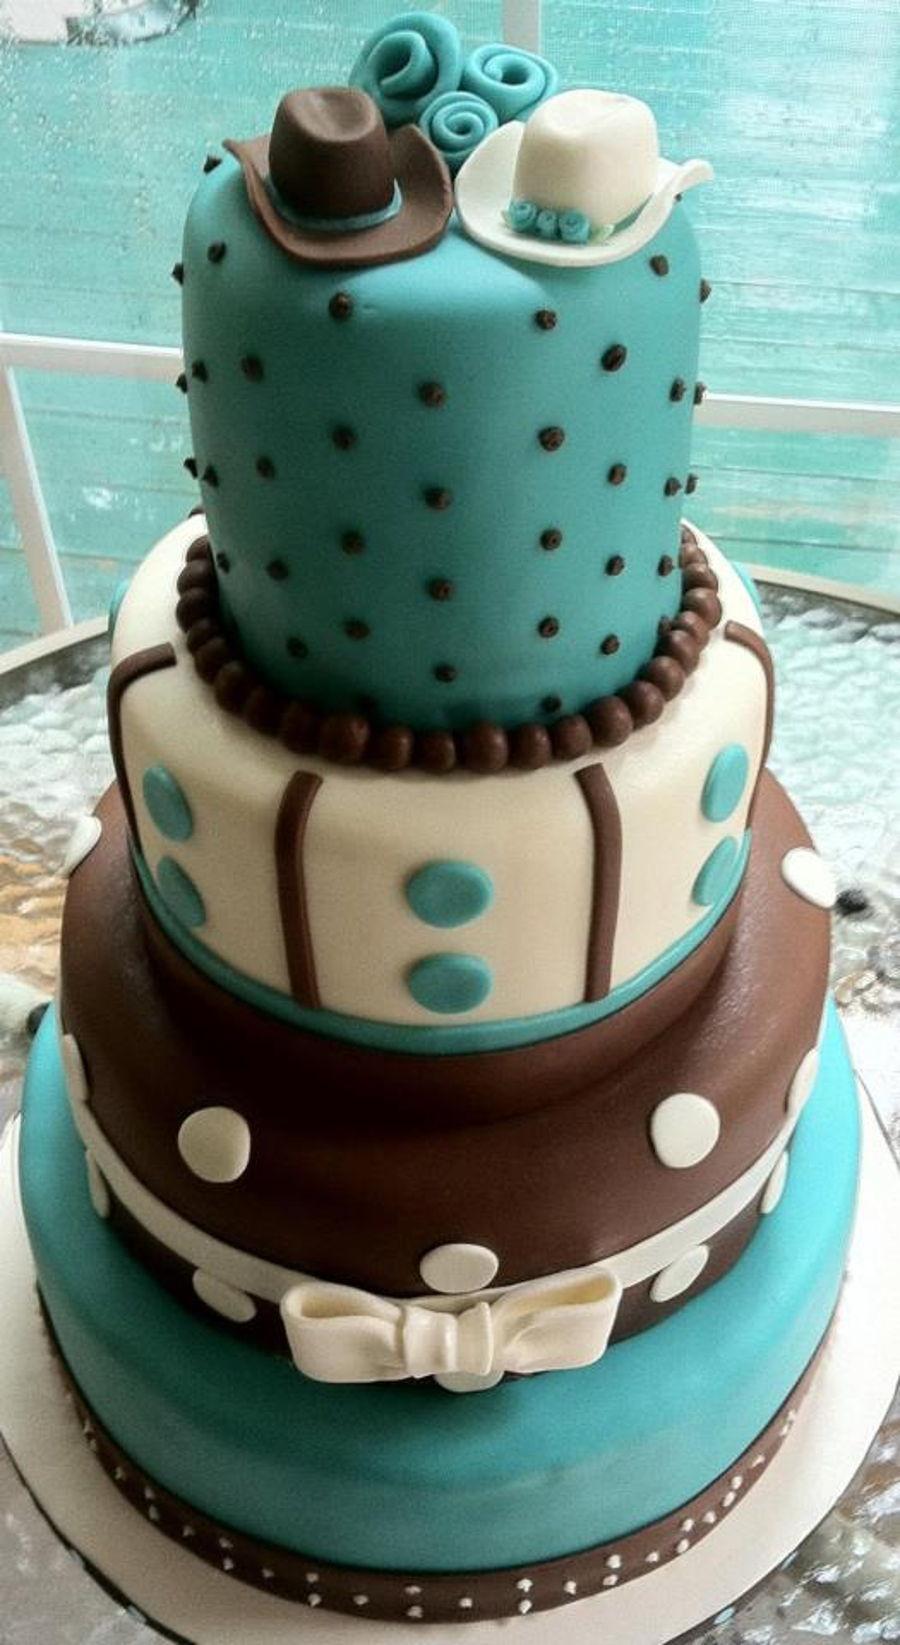 Cowboy Wedding Cake - Teal & Chocolate Brown - CakeCentral.com